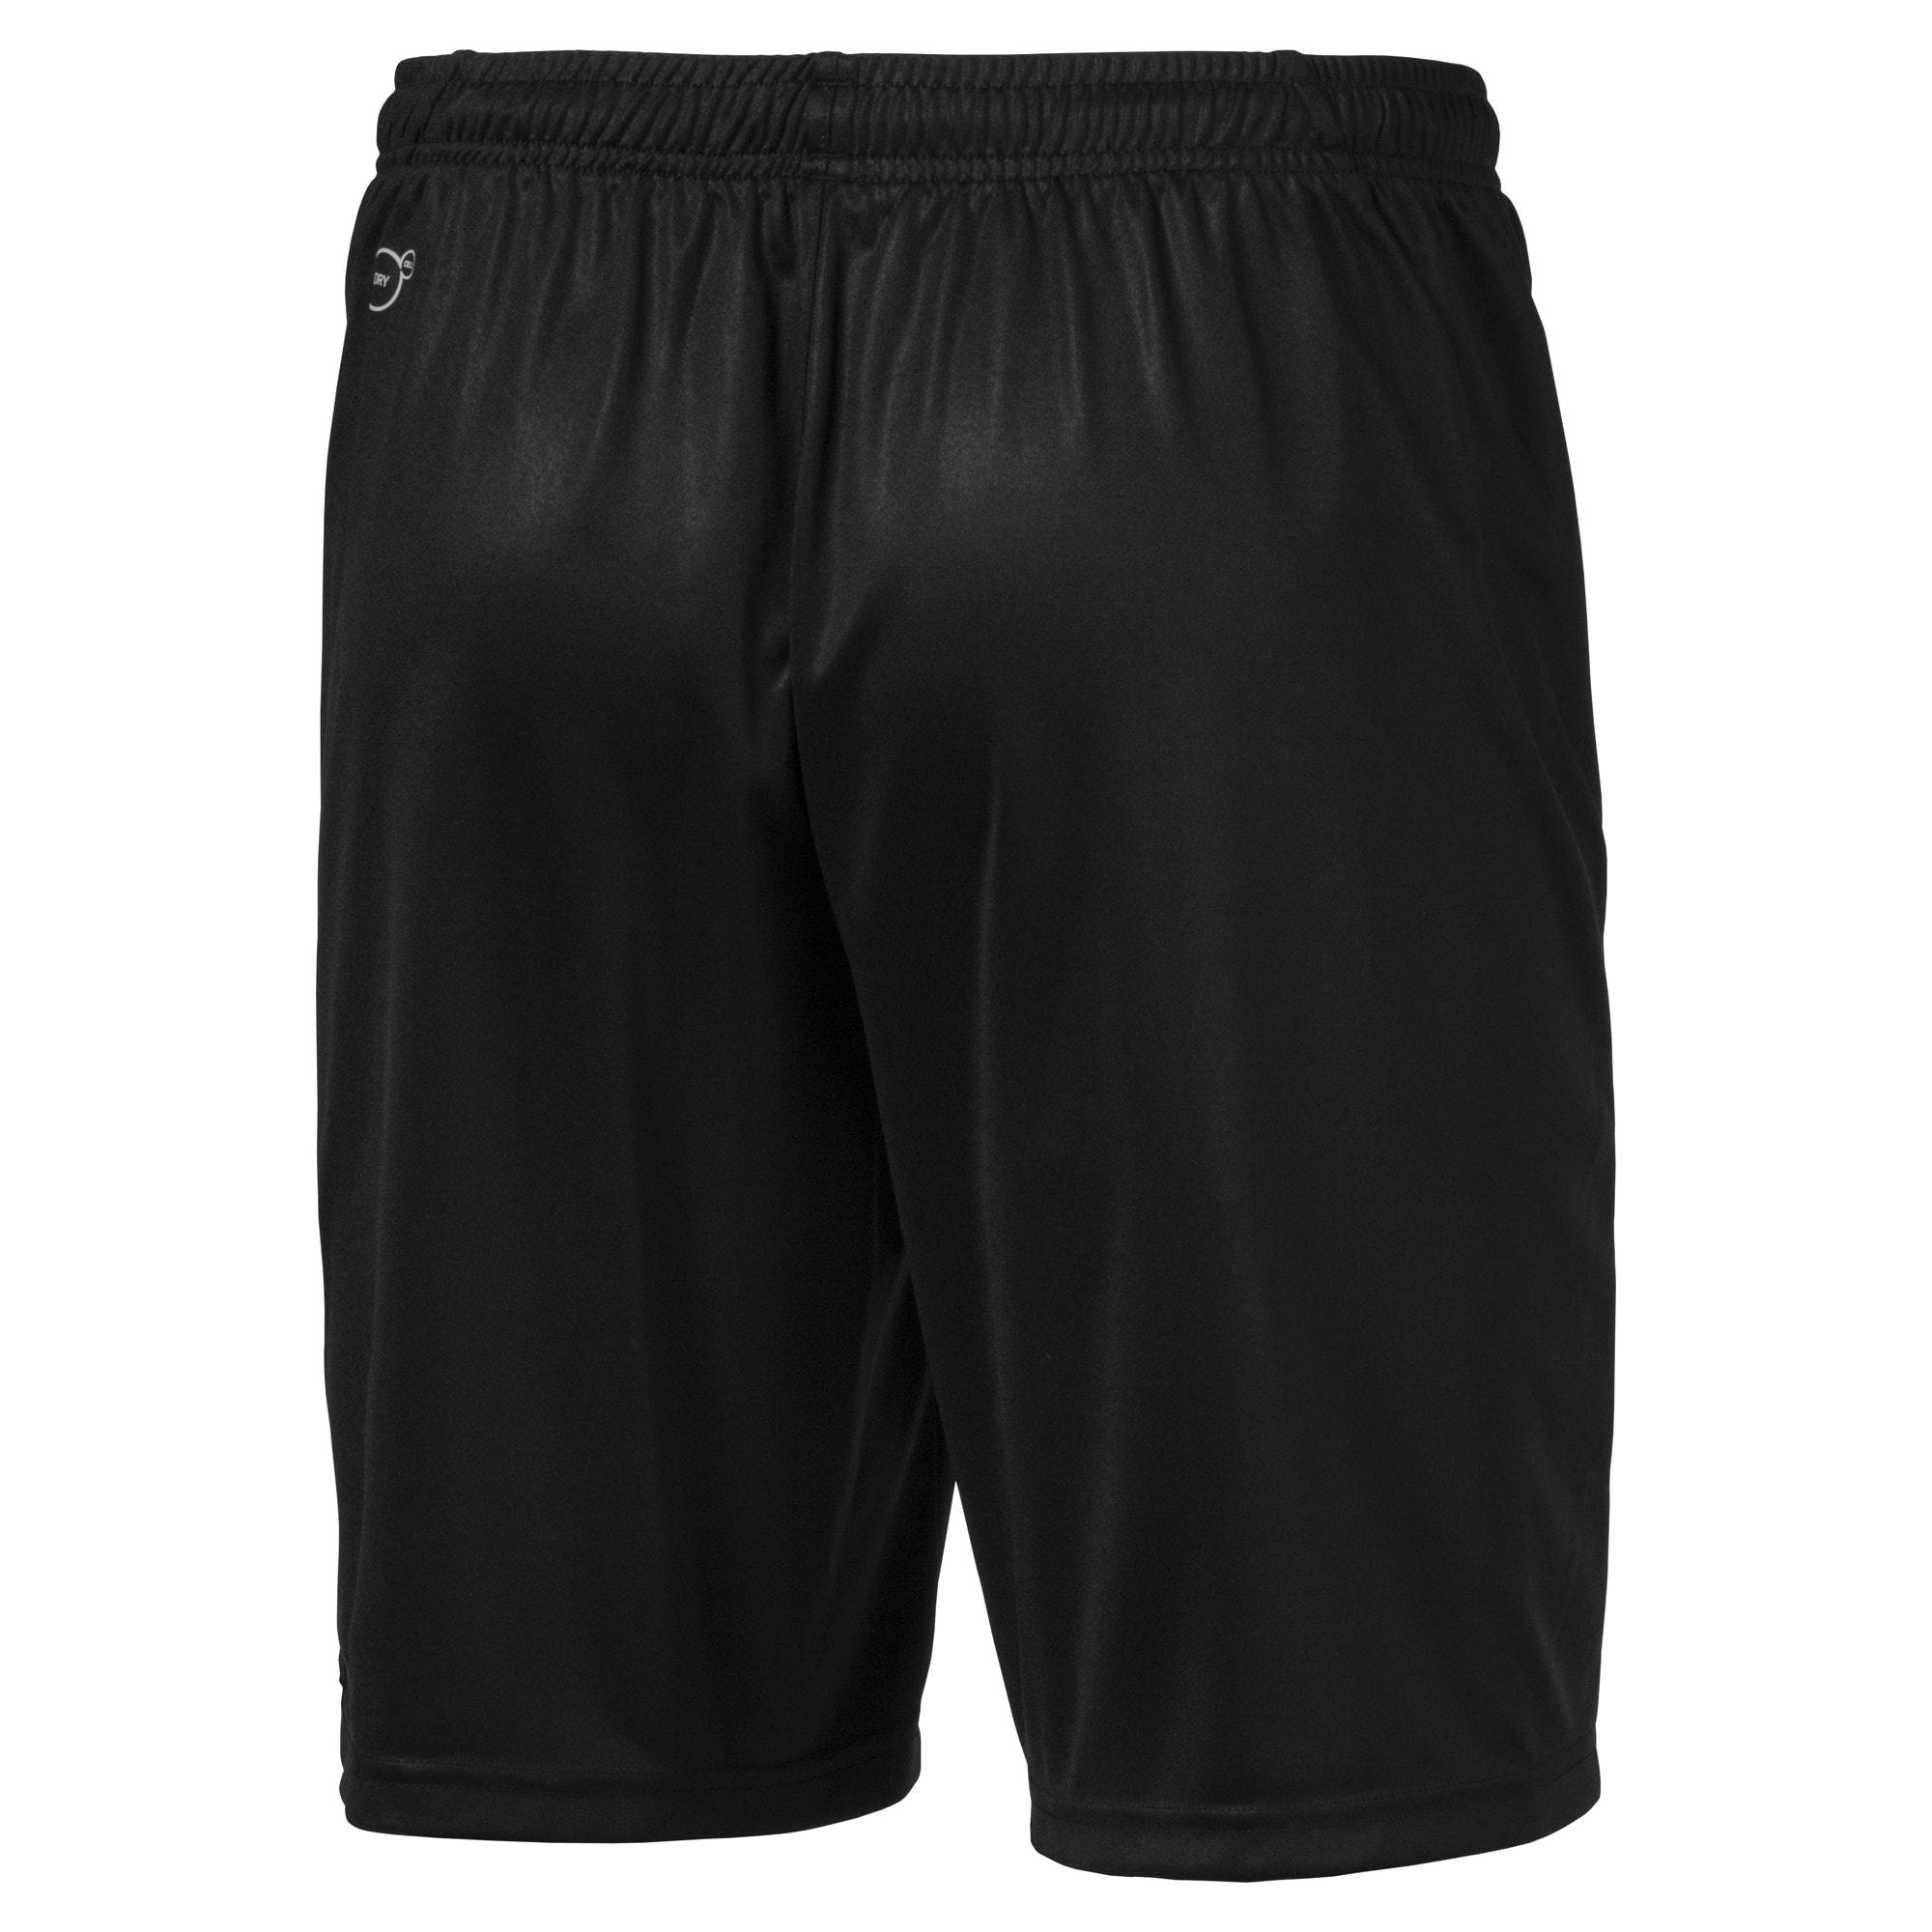 Thumbnail 5 of Liga Core Men's Shorts, Puma Black-Puma White, medium